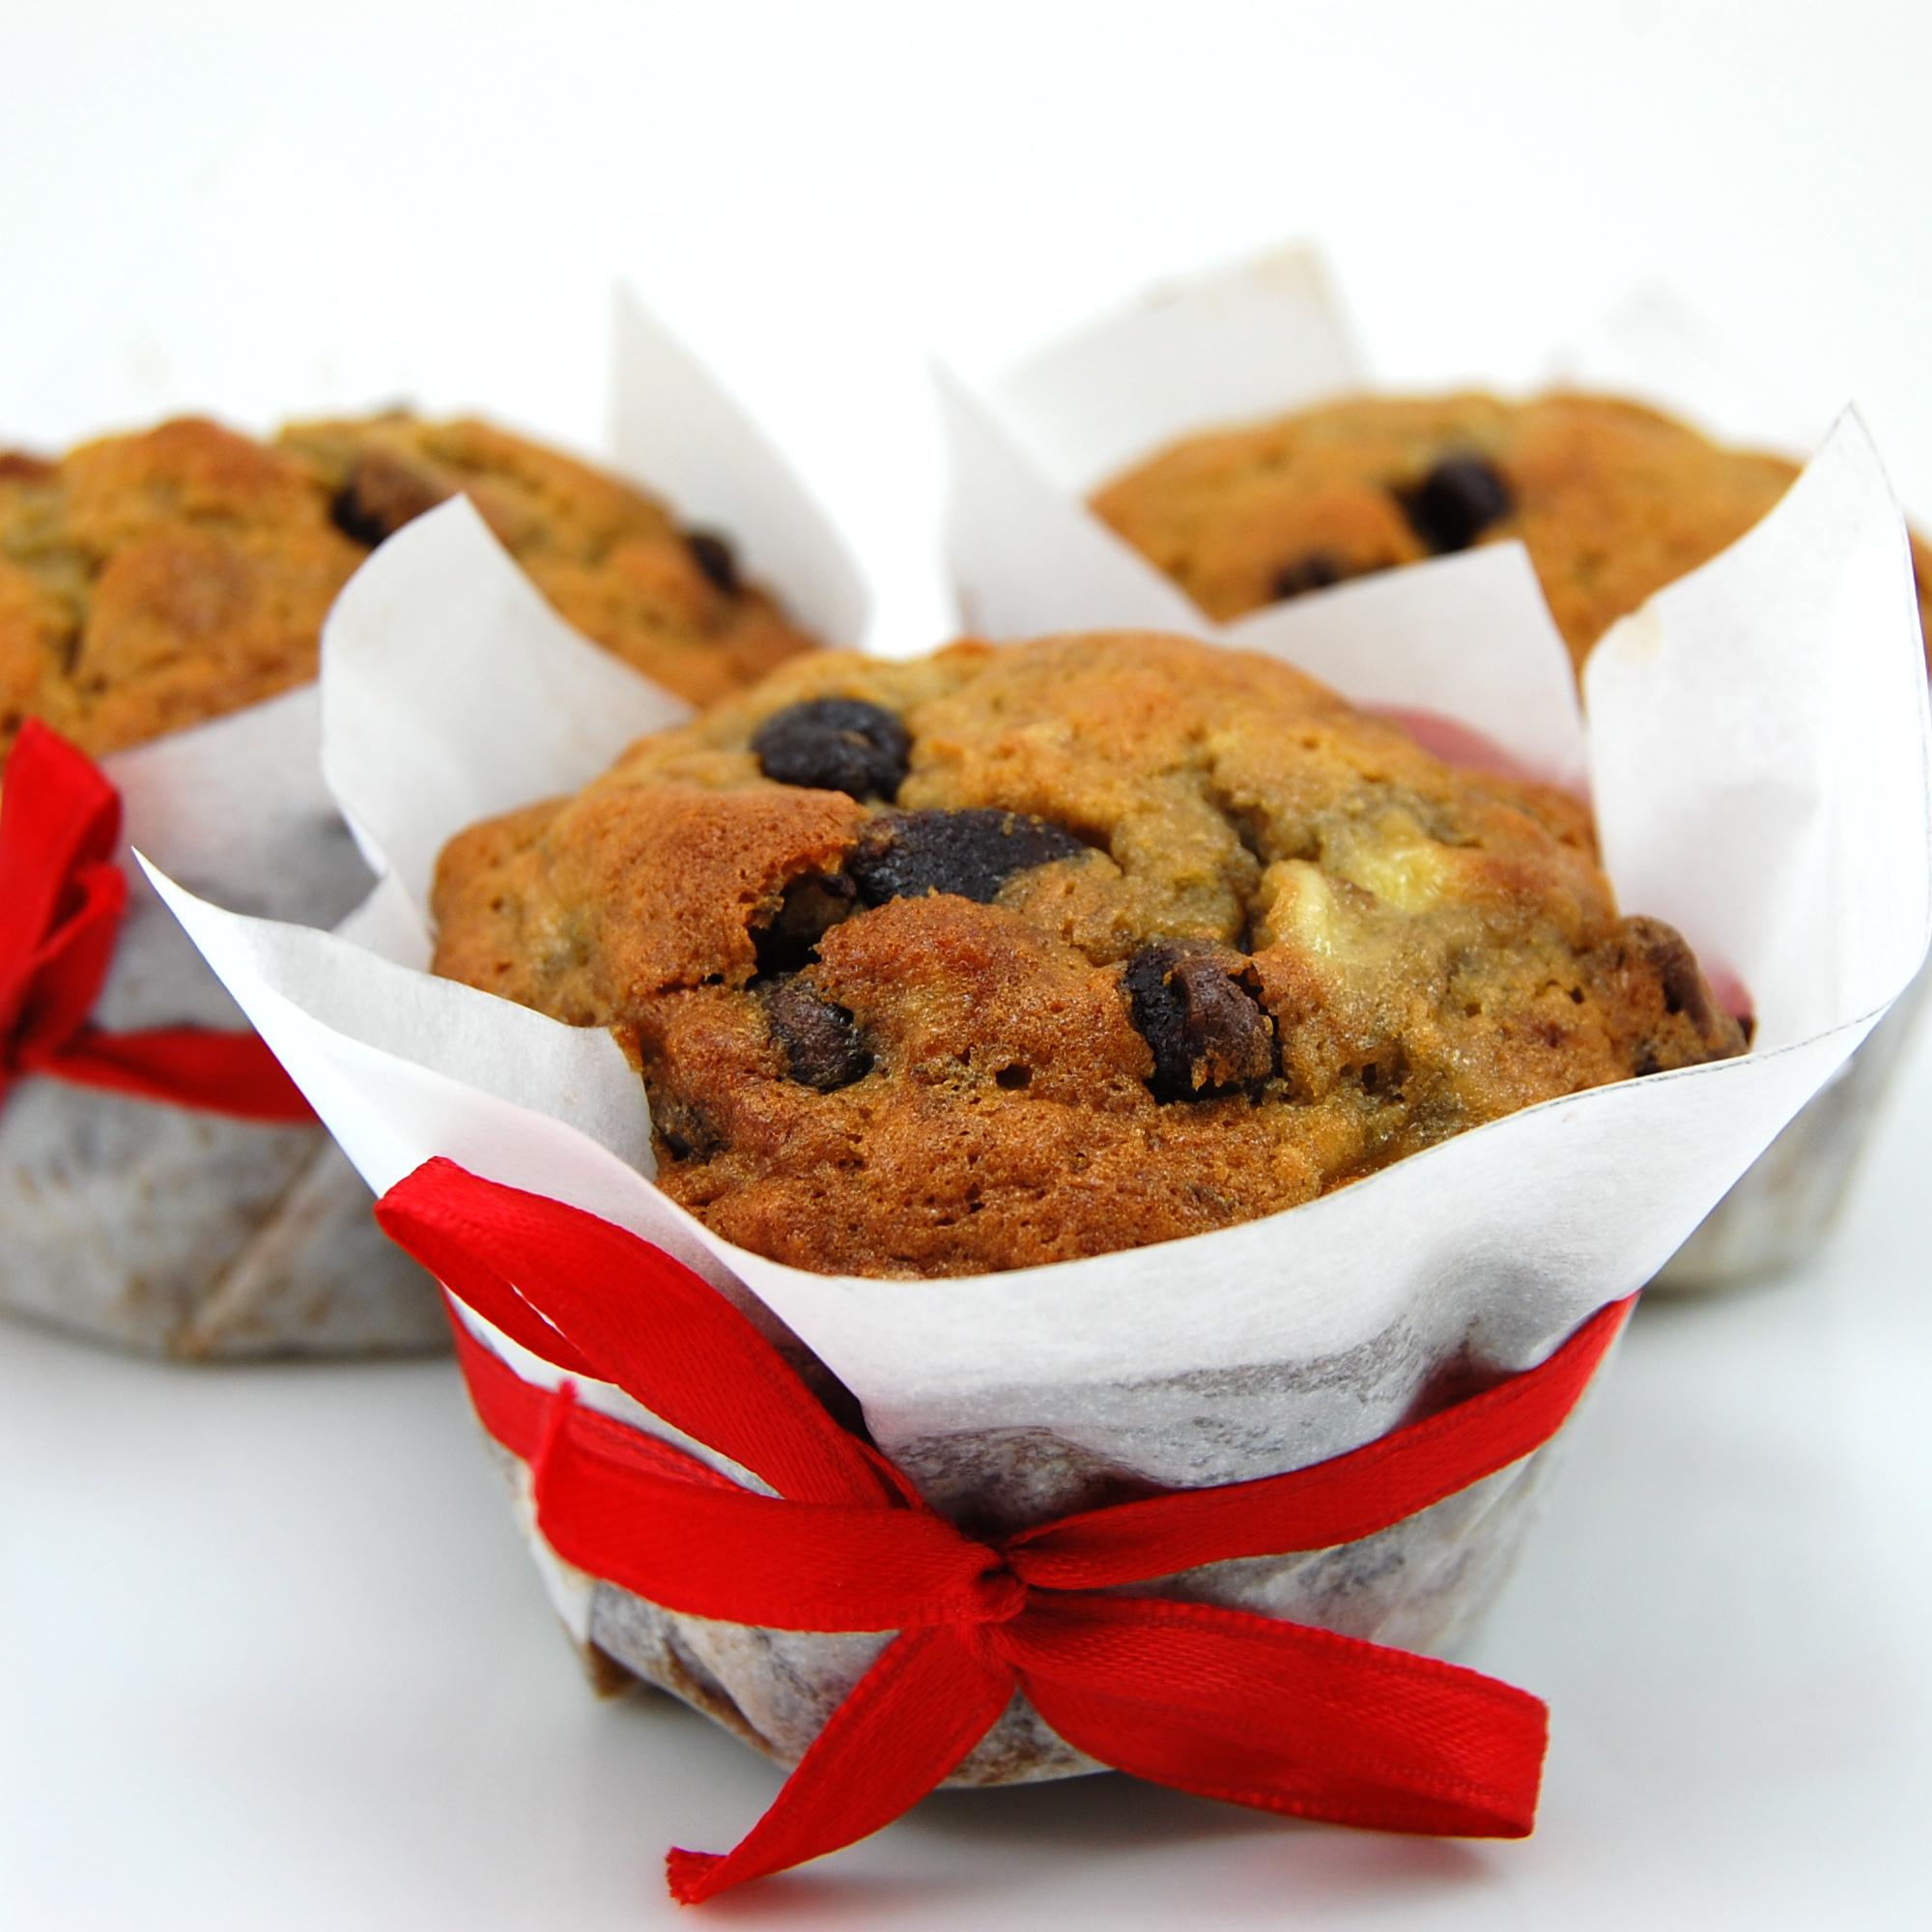 Sweet Pea's Kitchen » Banana Espresso Chocolate Chip Muffins